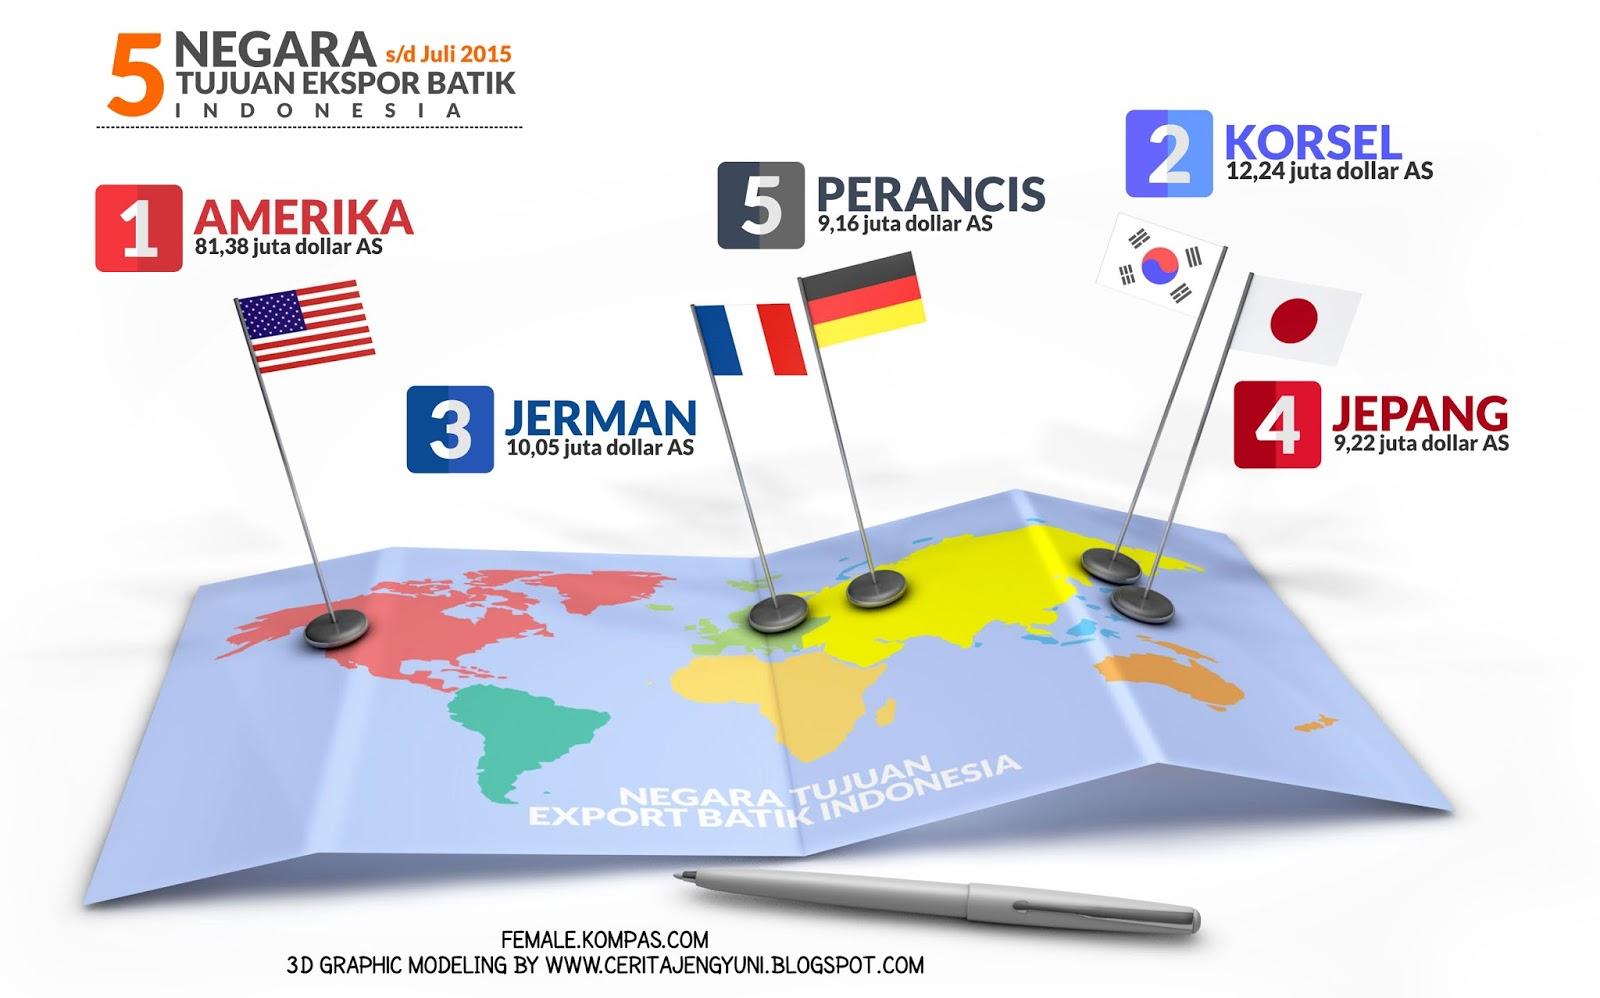 5 negara tujuan eksport batik